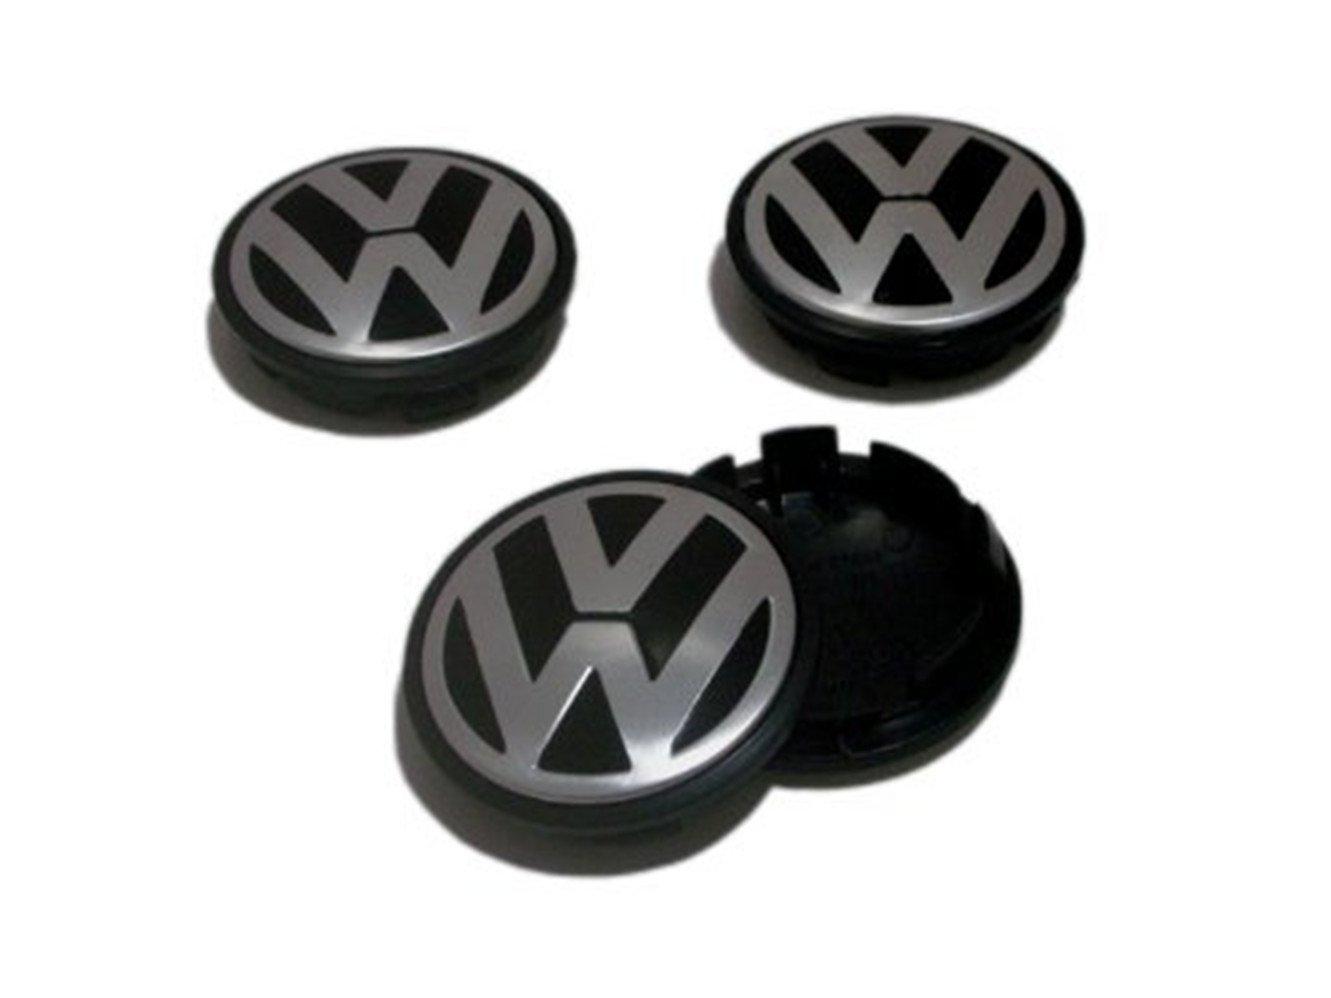 guoyuanzed VW Caddy EOS Golf Jetta Passat CC Phaeton Scirocco Sharan Tiguan Touran Transporter Hubcap Wheel Center Caps 3B7601171 3B7 601 171 (Juego de 4 ...